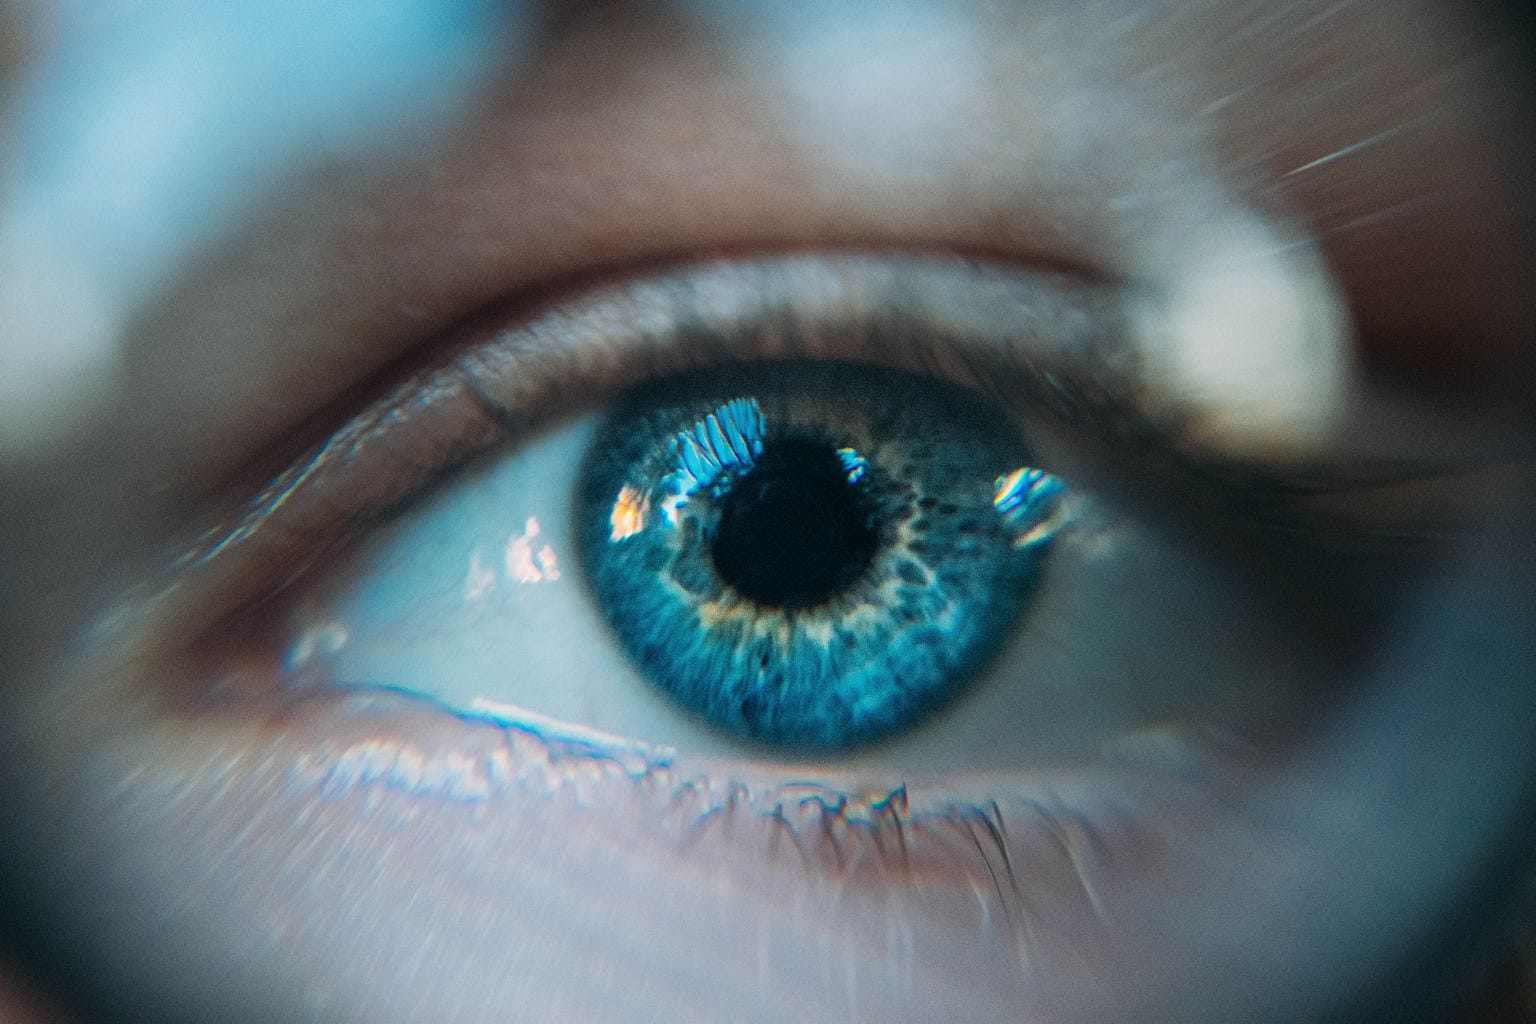 fotografía creativa de un ojo azul